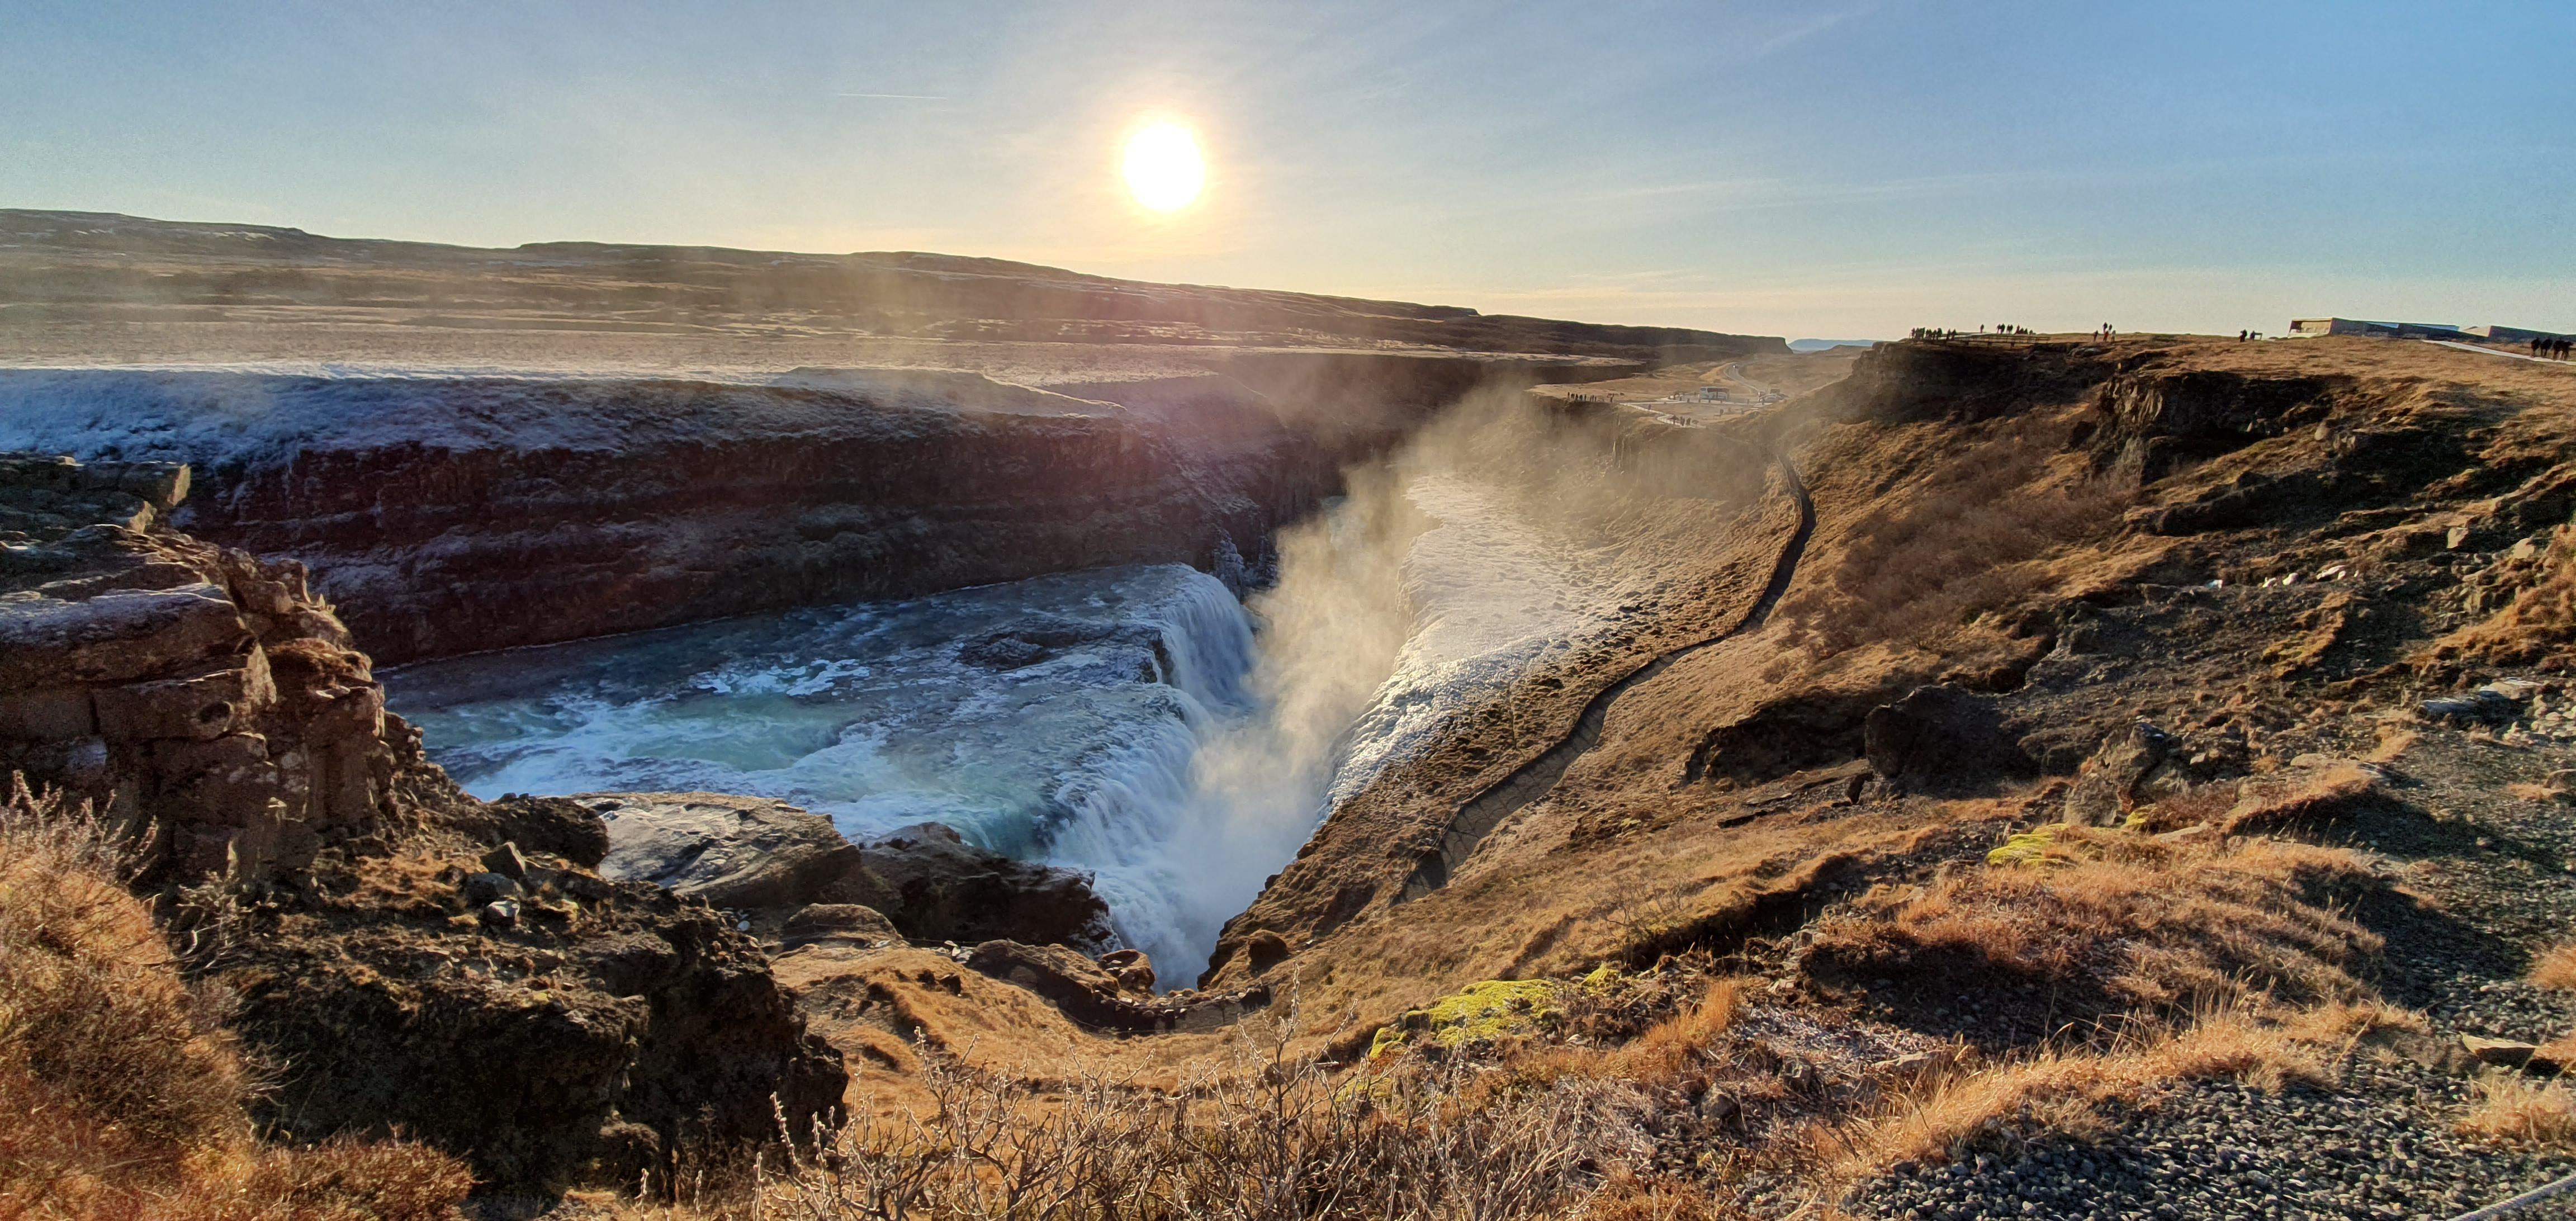 Iceland Gullfos Unedited Oc 4608 X 2184 In 2020 Beautiful Nature Landscape Photographers Landscape Photography